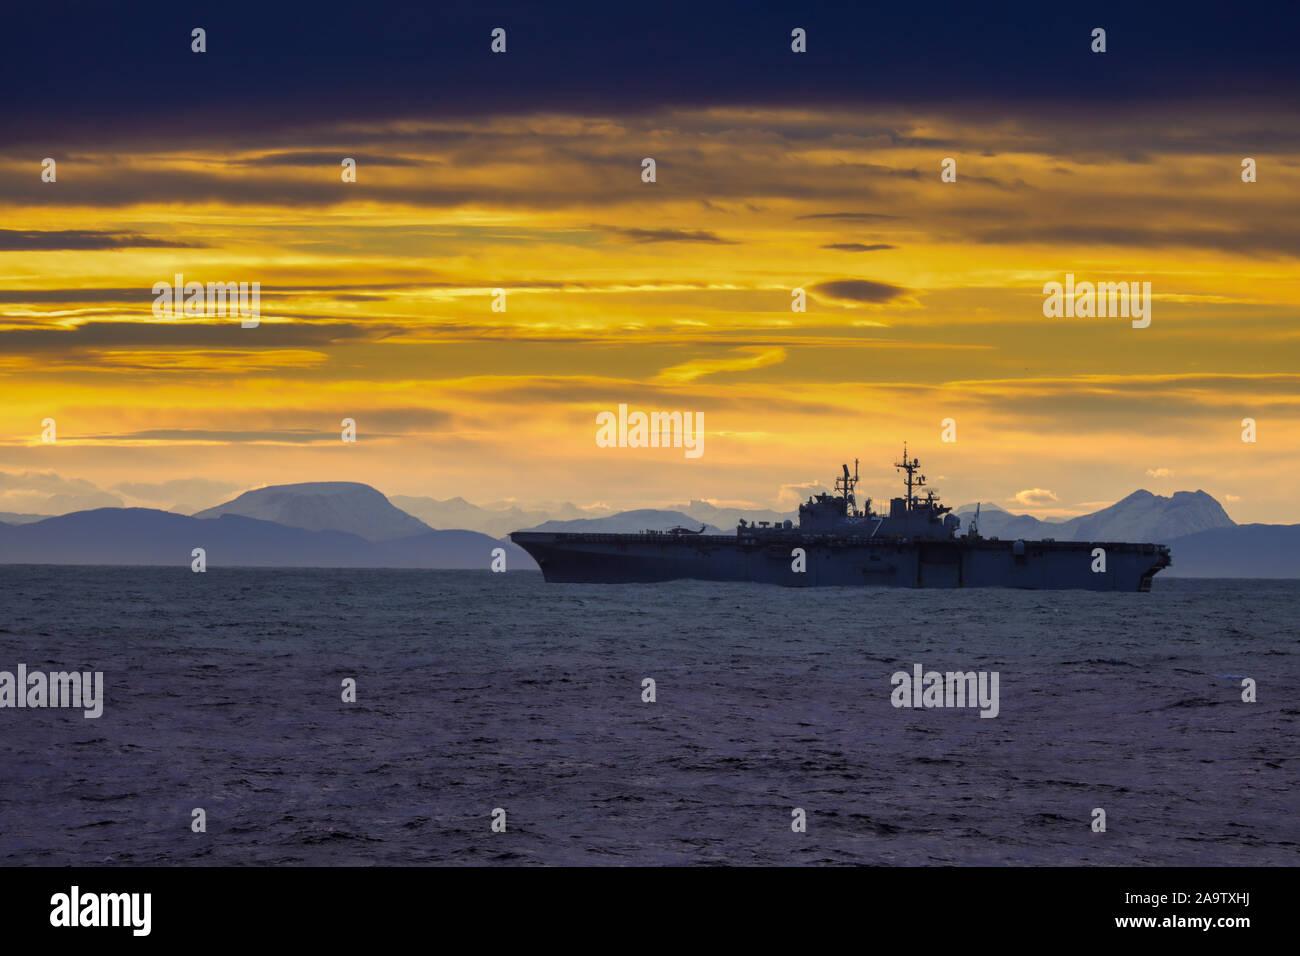 USS Iwo Jima a Wasp class amphibious assault ship of the United States Navy off the coast of Norway Stock Photo